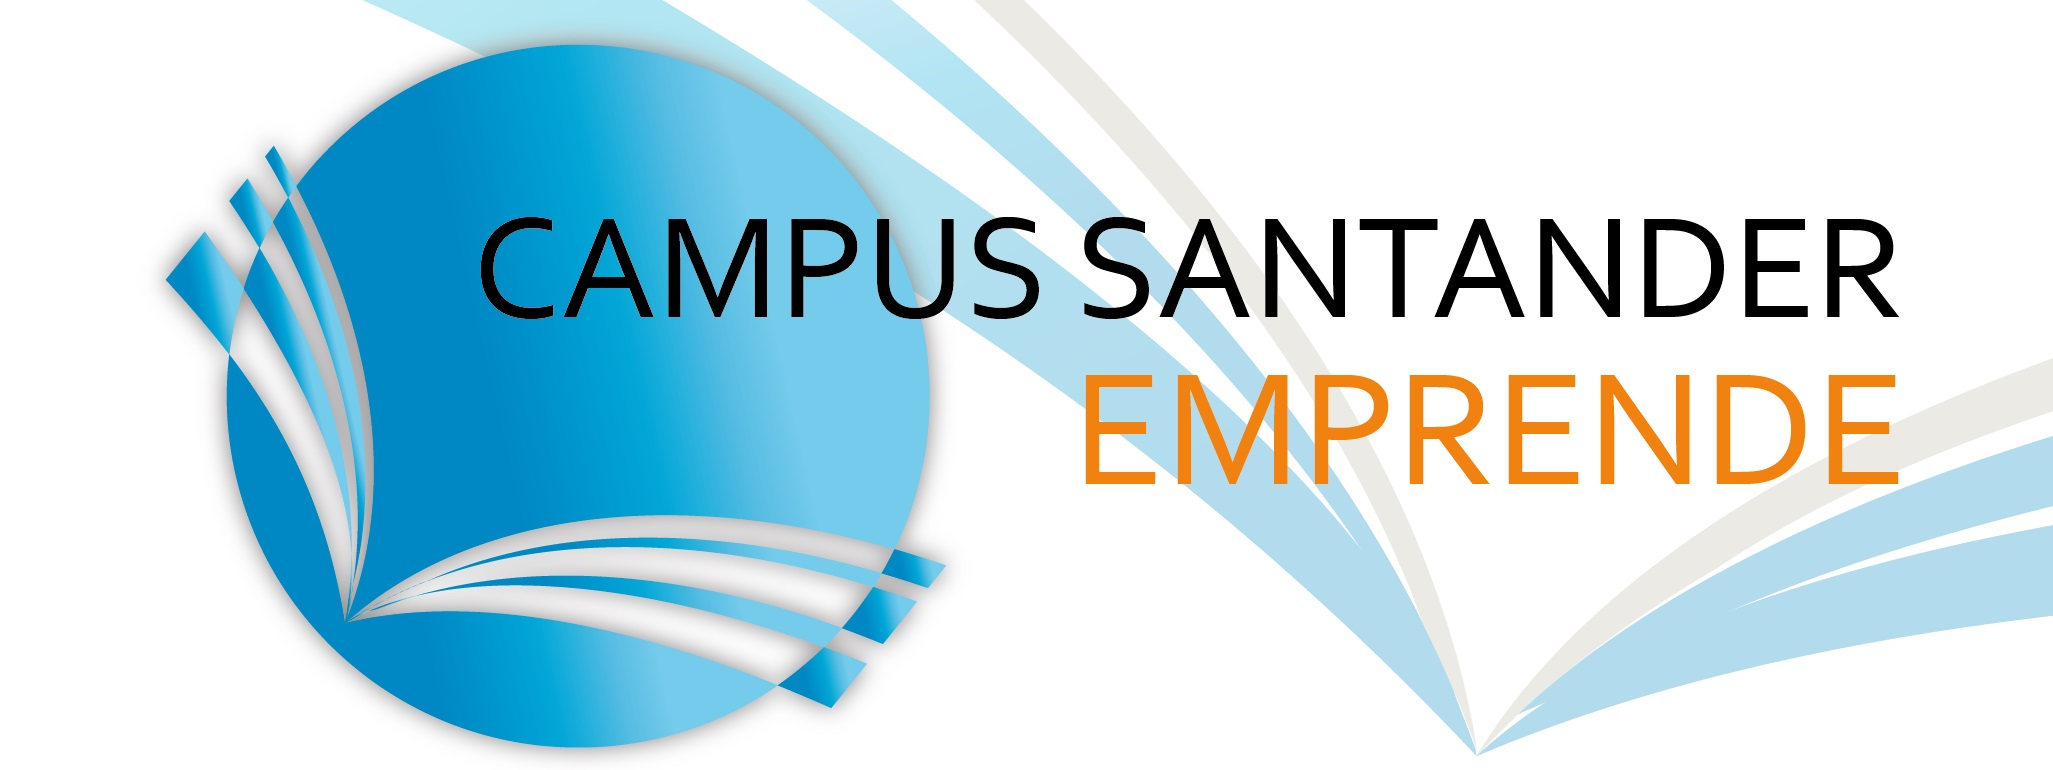 campus_santander_emprende_0.jpg